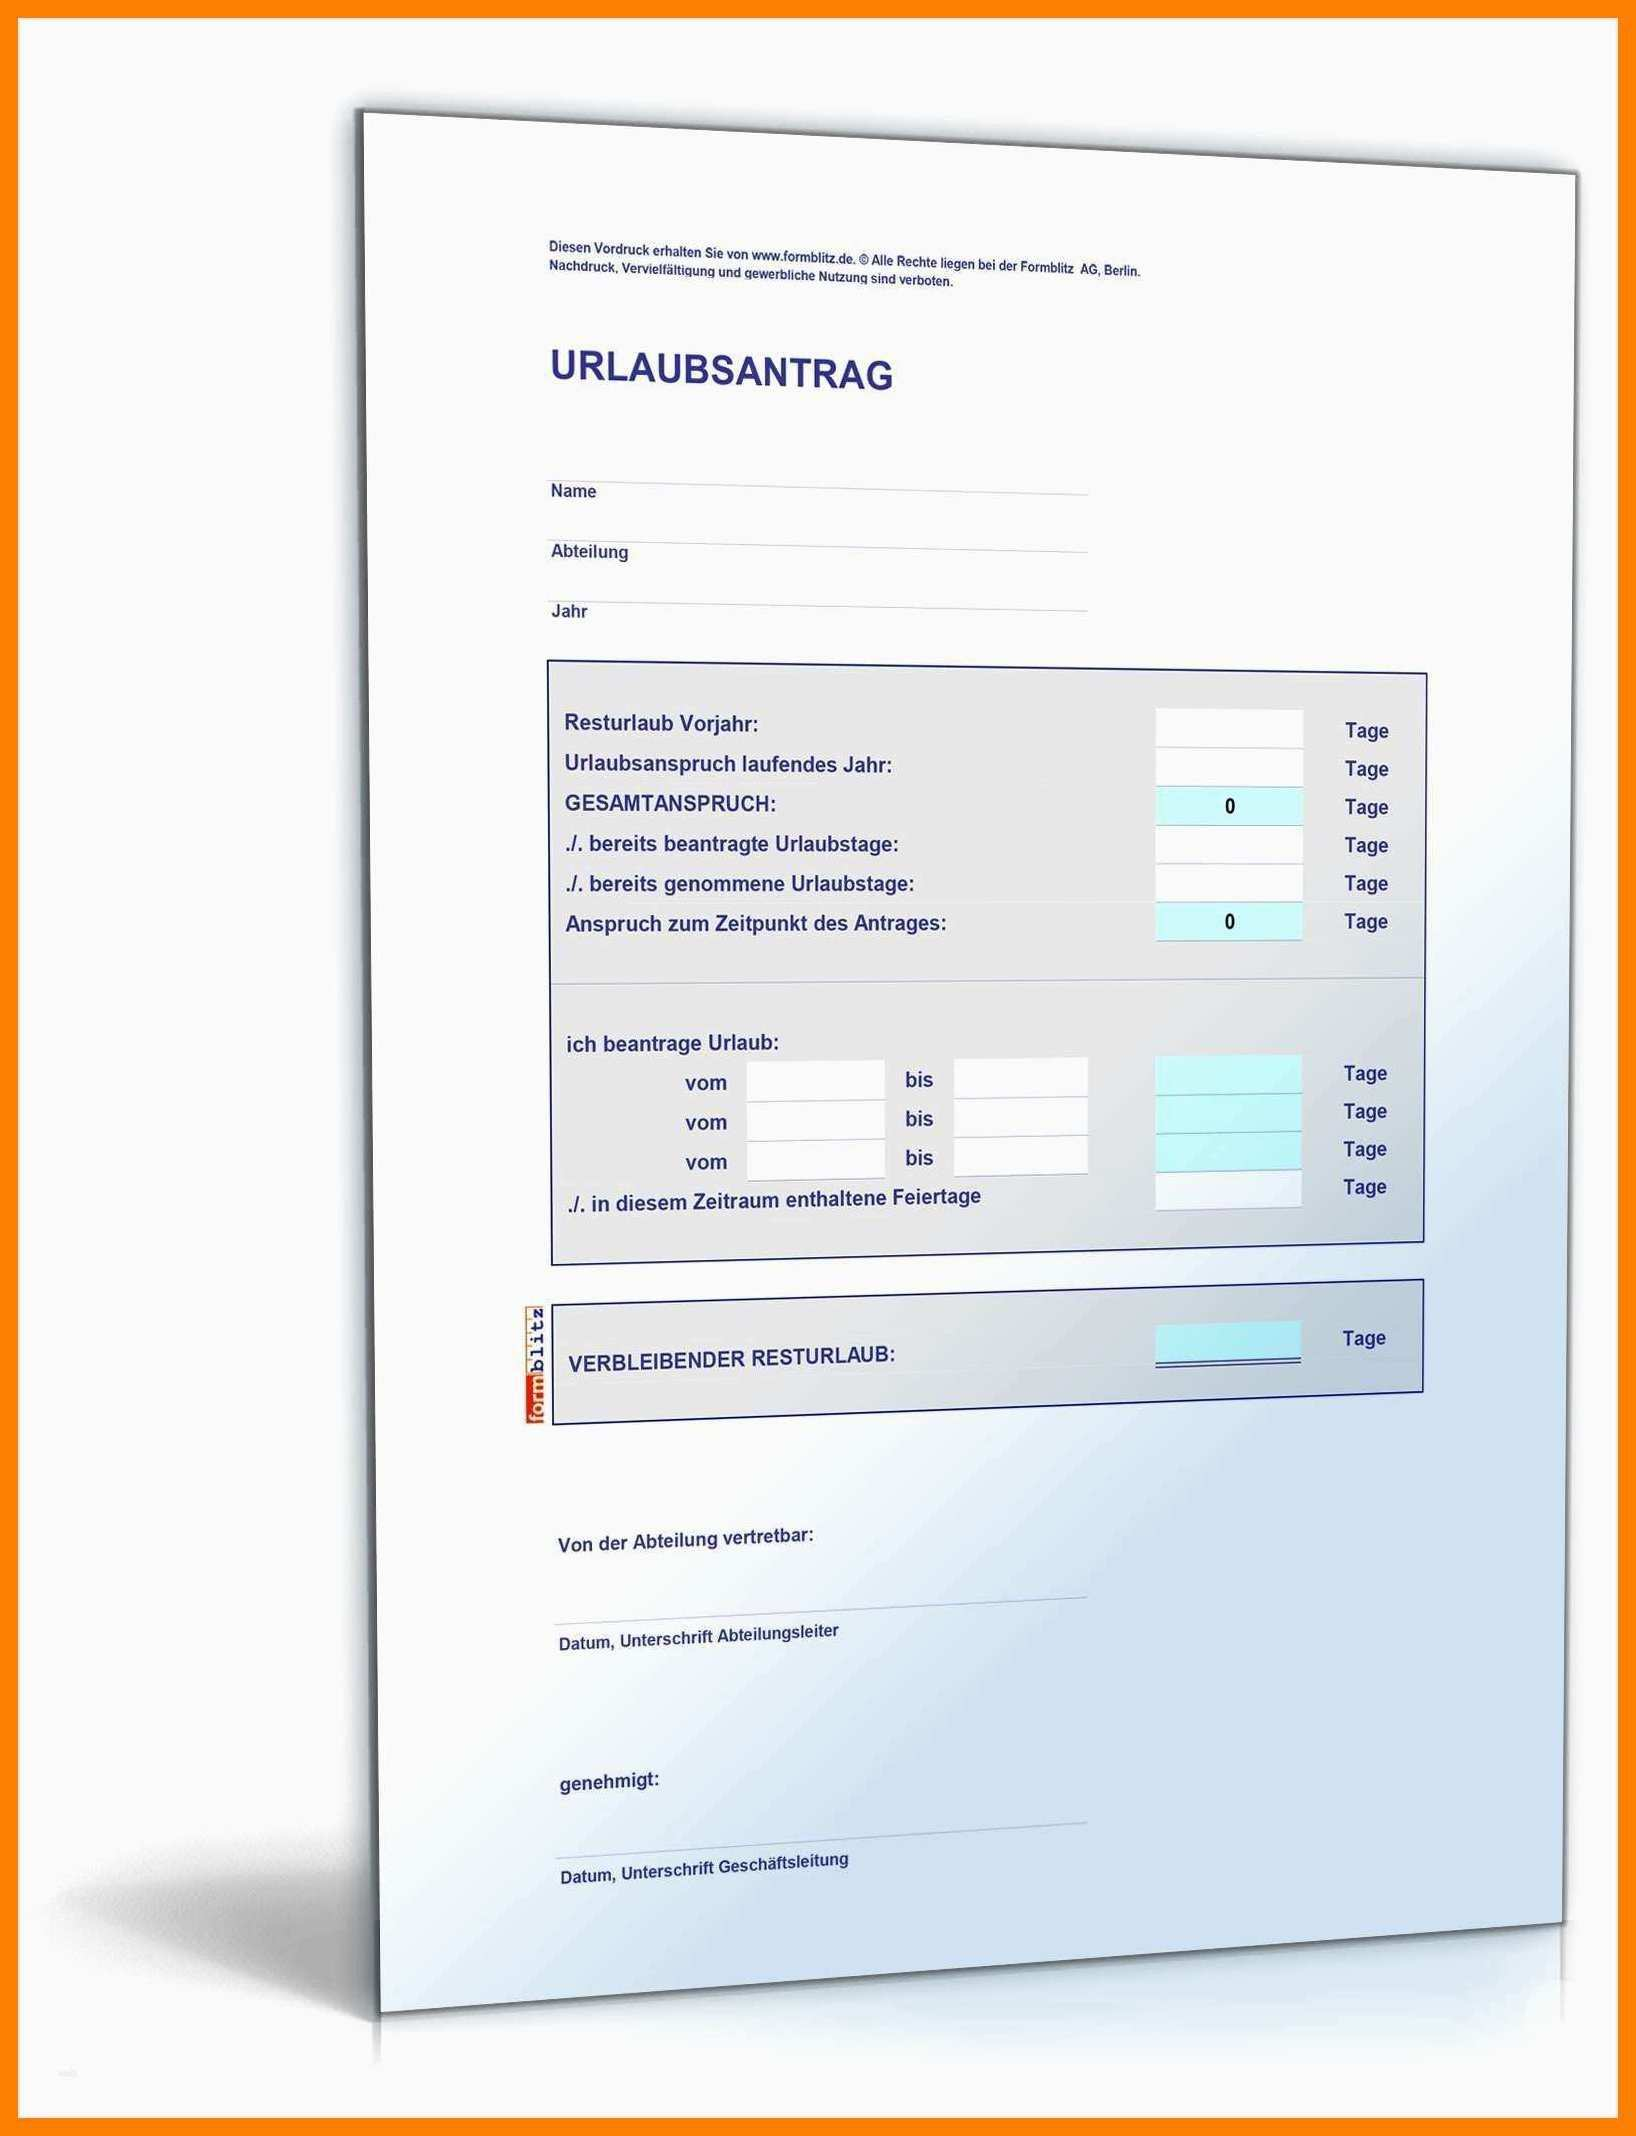 Urlaubsantrag Vorlage Kostenlos Excel لم يسبق له مثيل الصور